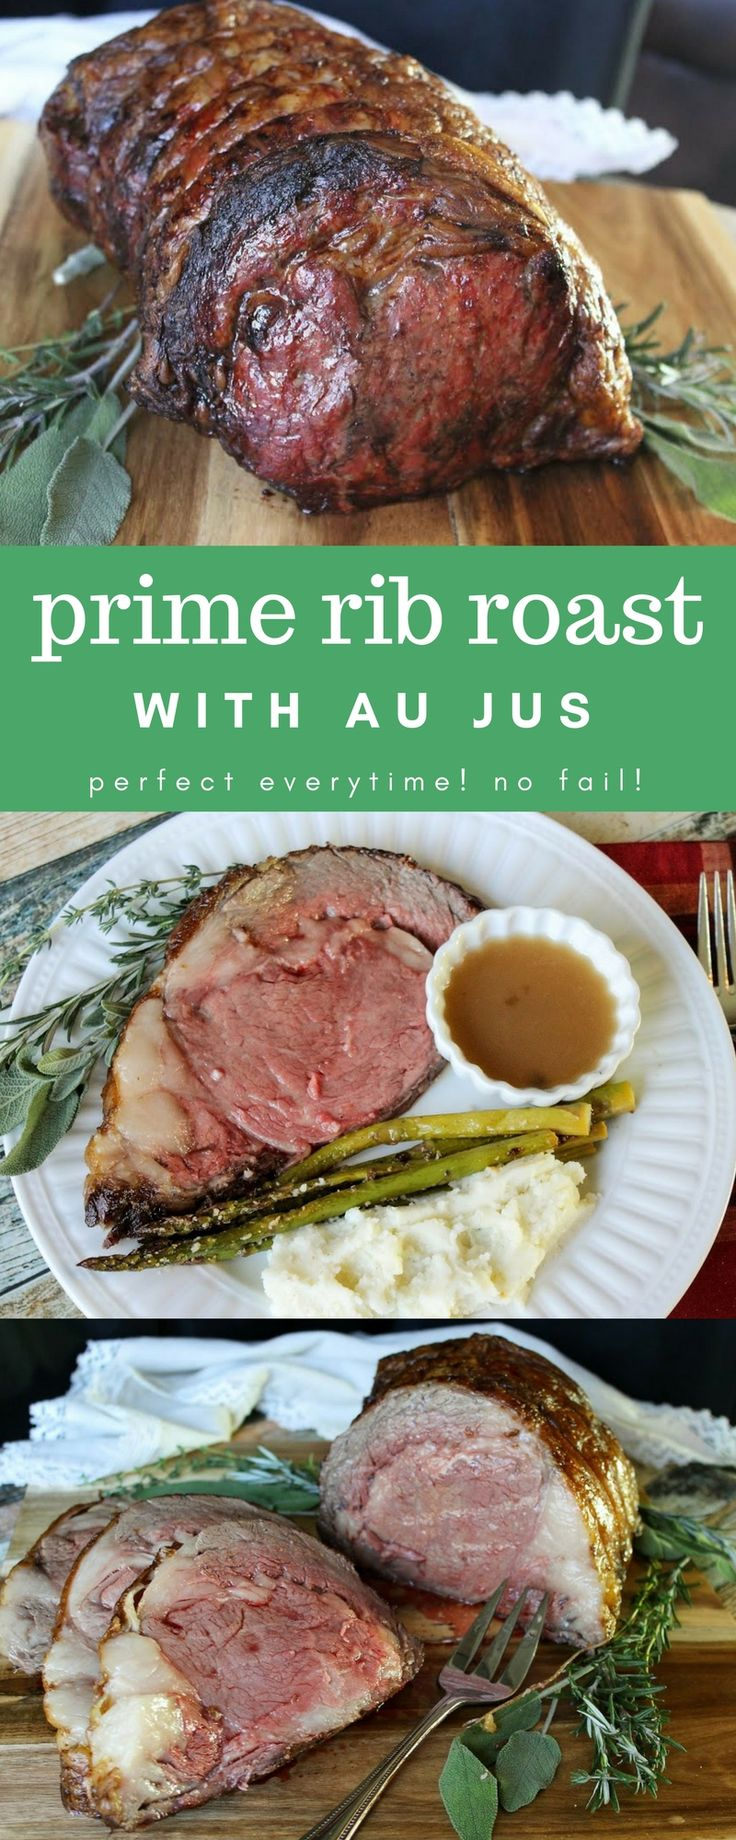 Your new go-to prime rib roast recipe with au jus! It's perfect every time, no fail! #primerib #primeribroast #dinnertime #recipes #christmasdinner #dinnerideas